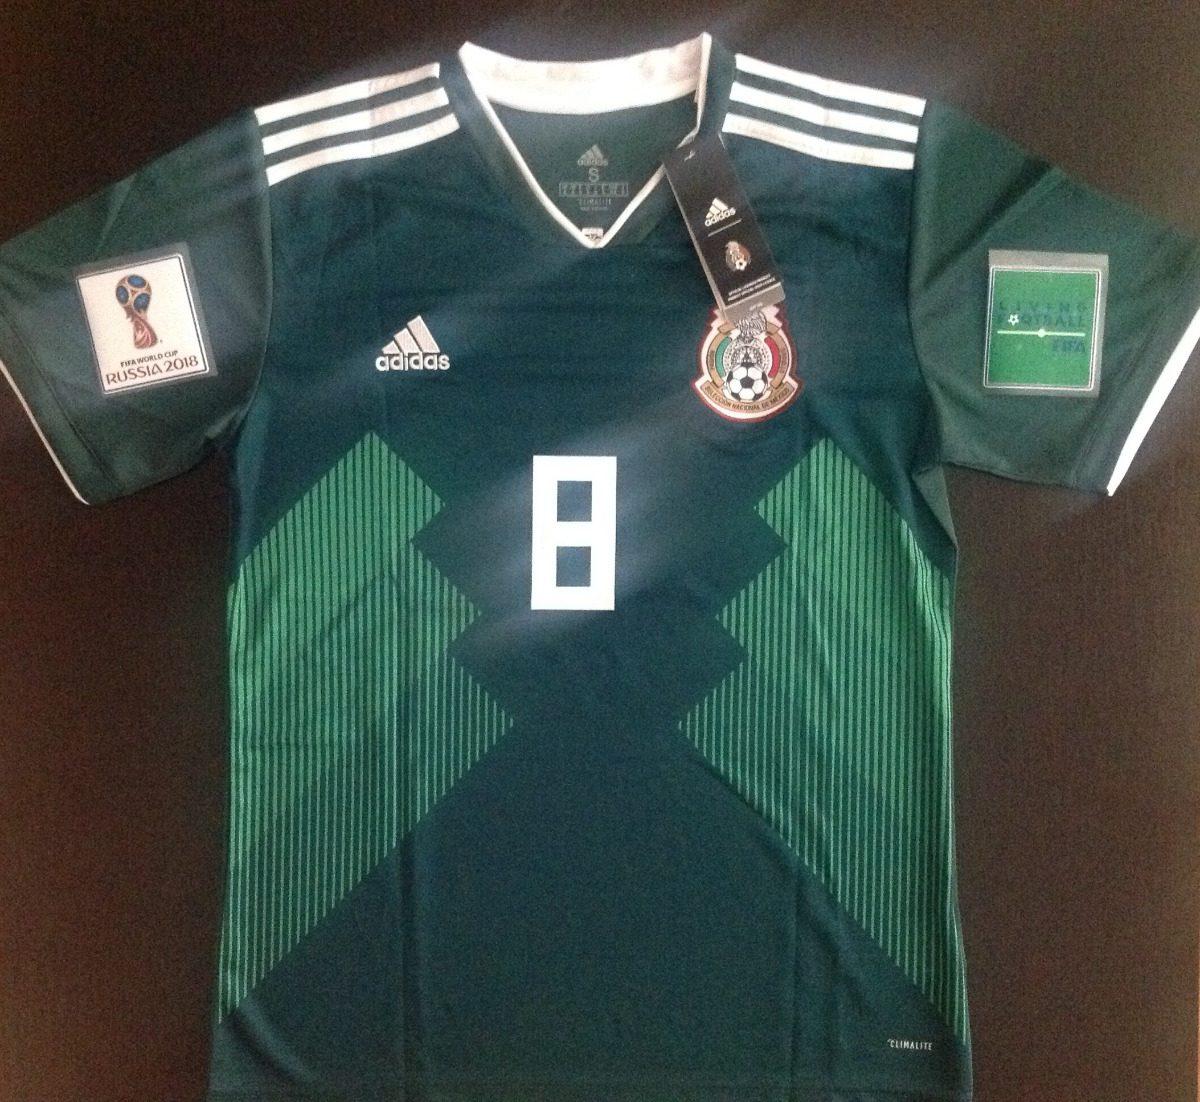 29eabe934d314 fabuloso jersey mexico mundial 2018 chucky lozano 8 parches. Cargando zoom.